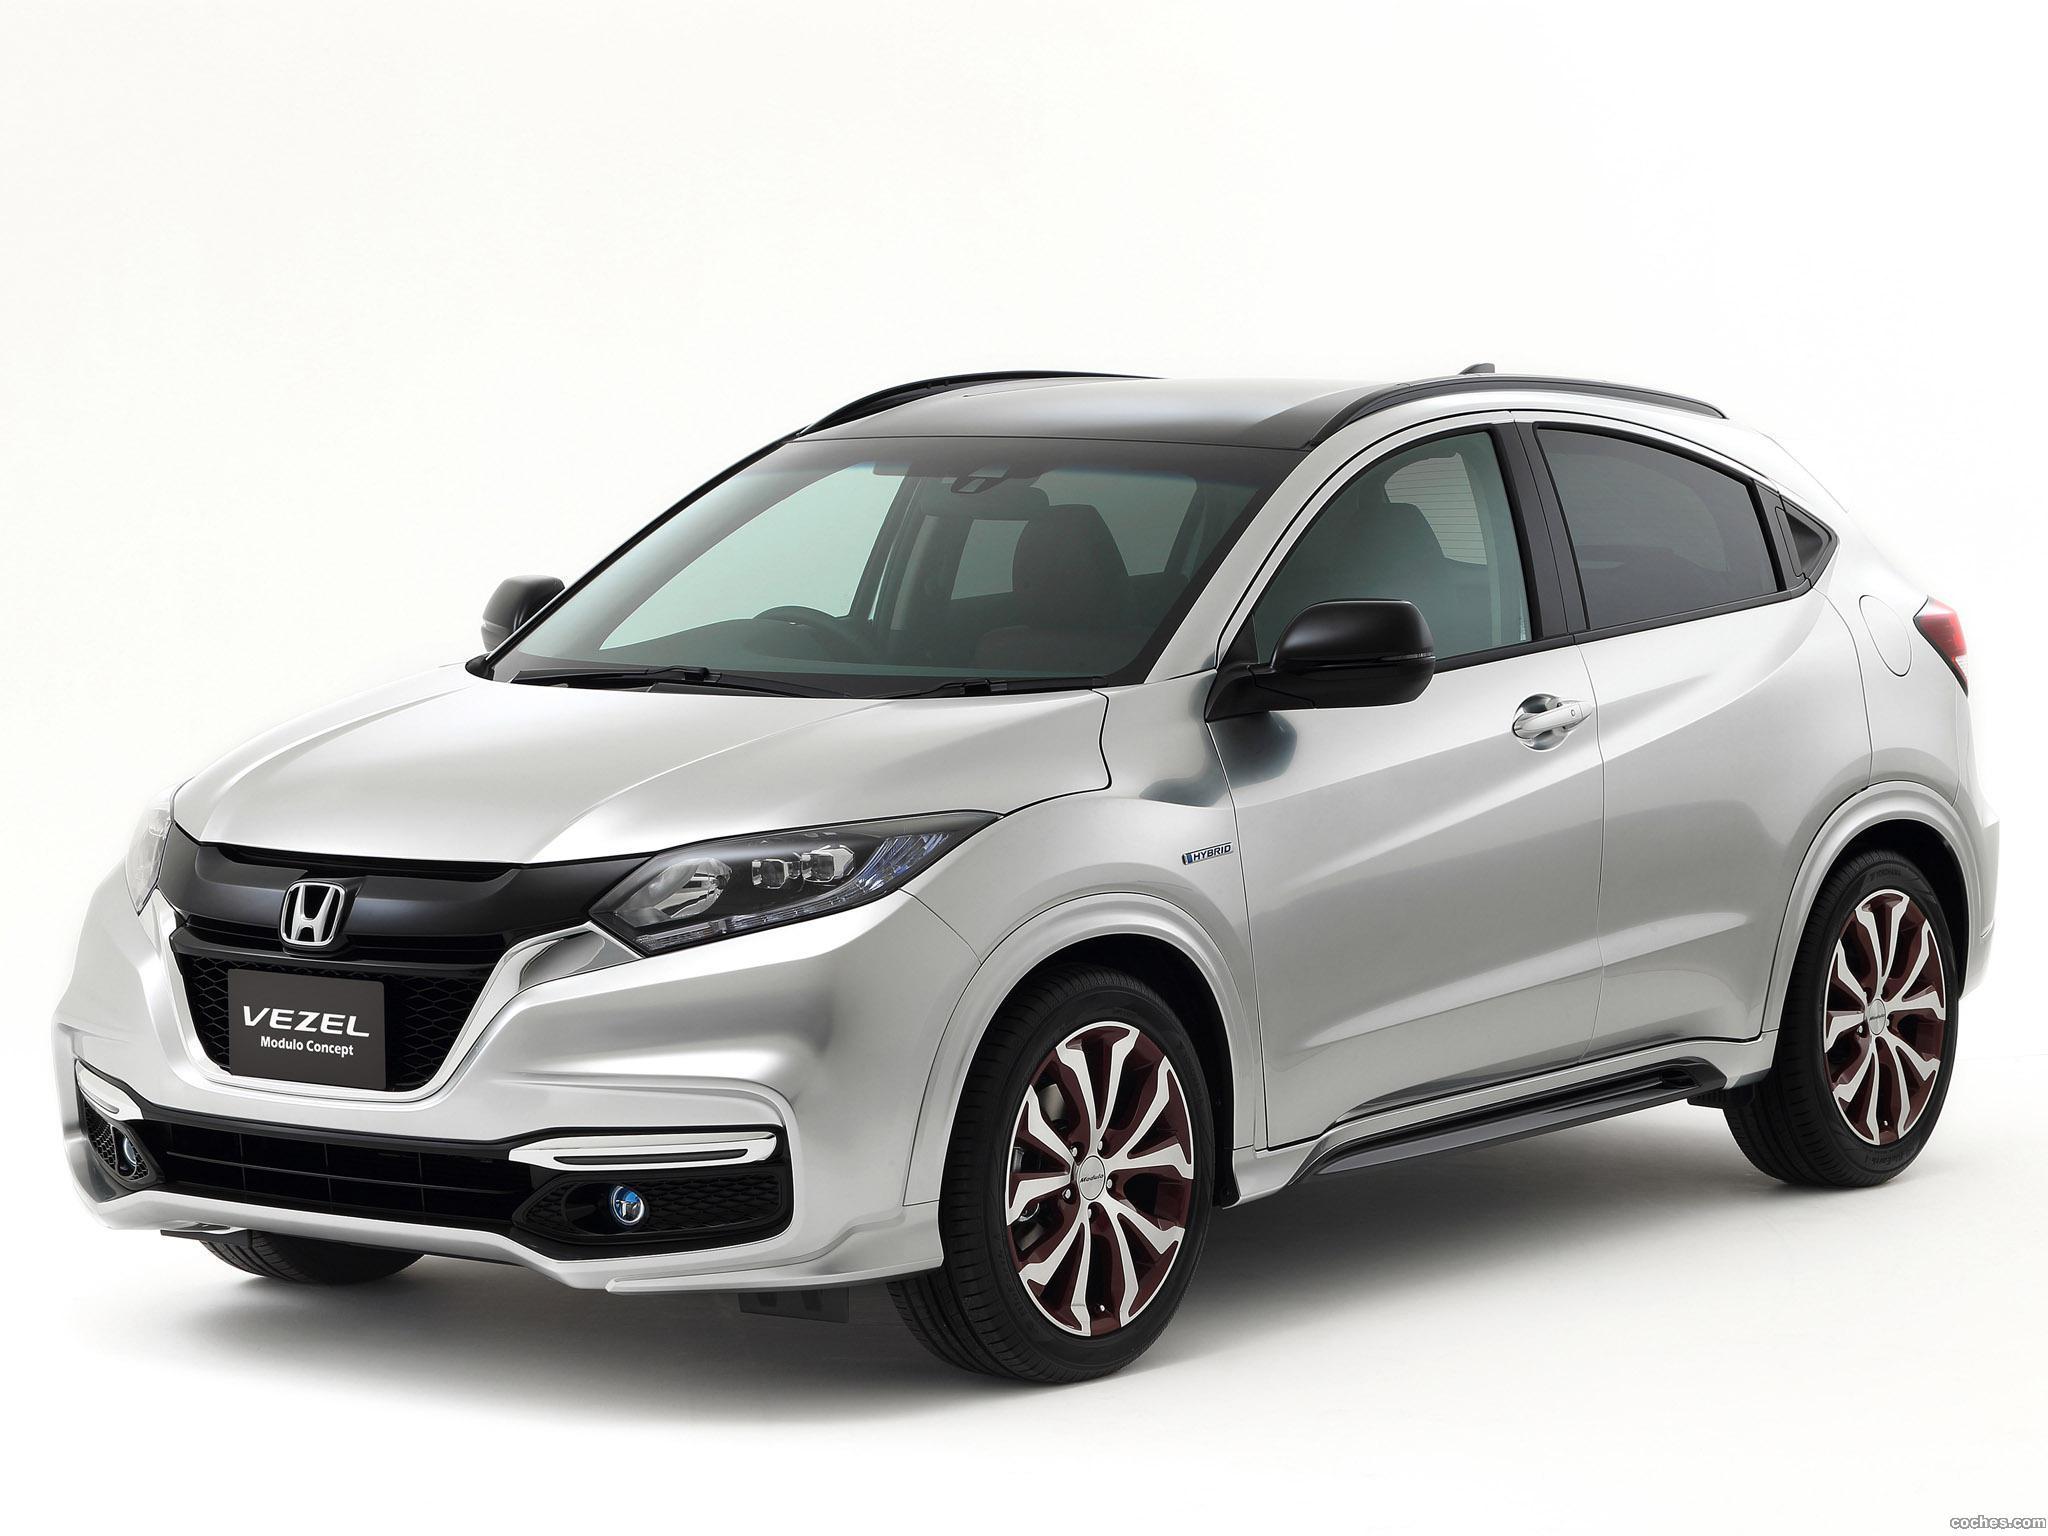 Foto 0 de Modulo Honda Vezel Concept 2014